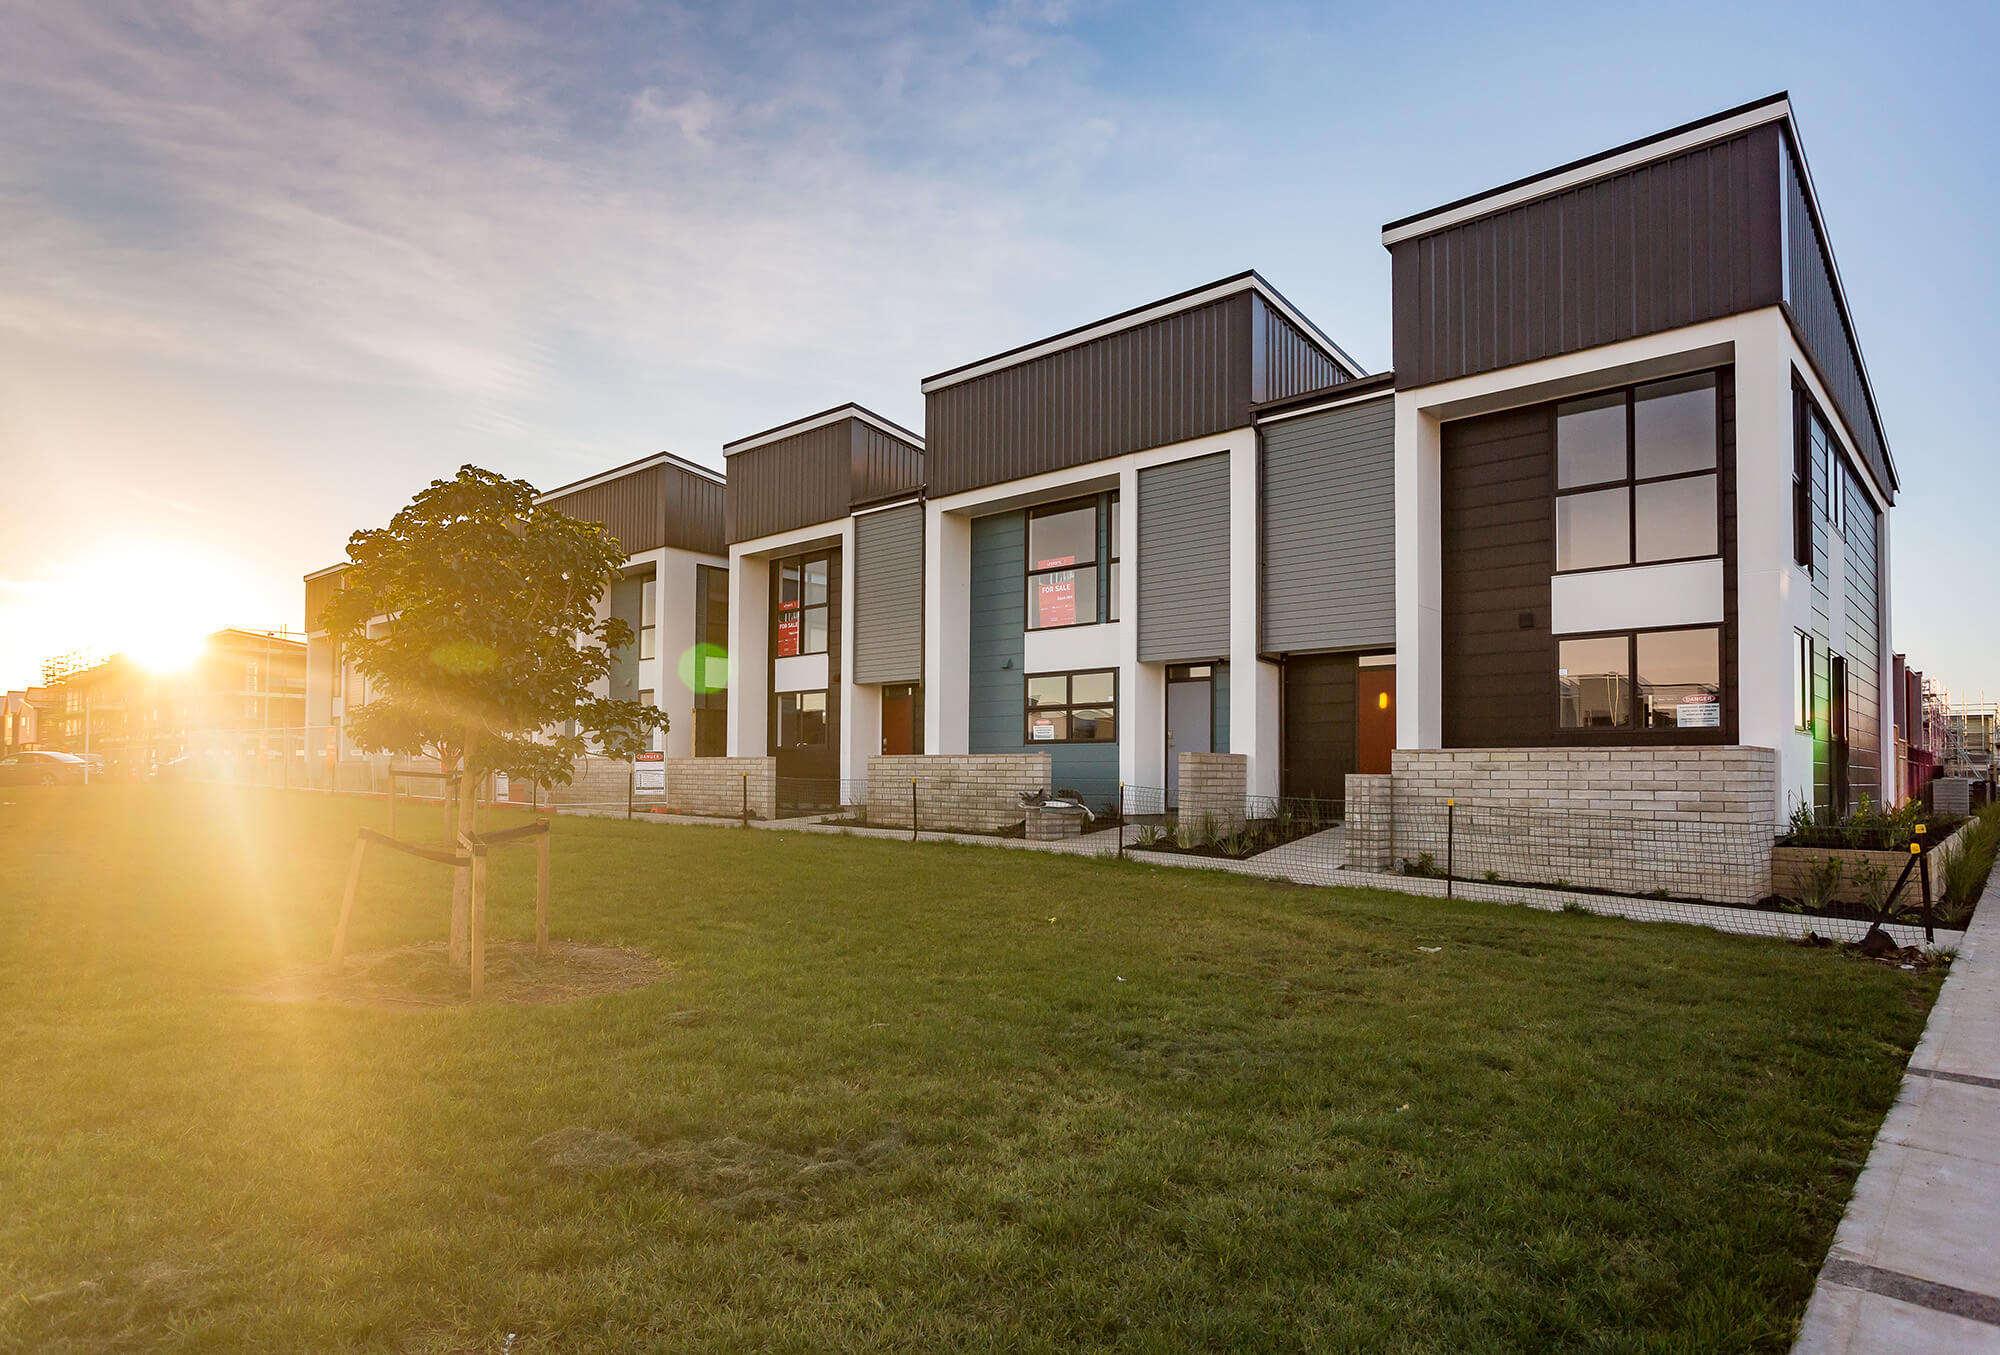 "Hobsonville Point 最大规模民宅建企:Universal Homes,60年经验筑造品质新房,为您开启""非凡·新·生活""! 198+套全新房持续开发中,优质户型,抢先预订。"